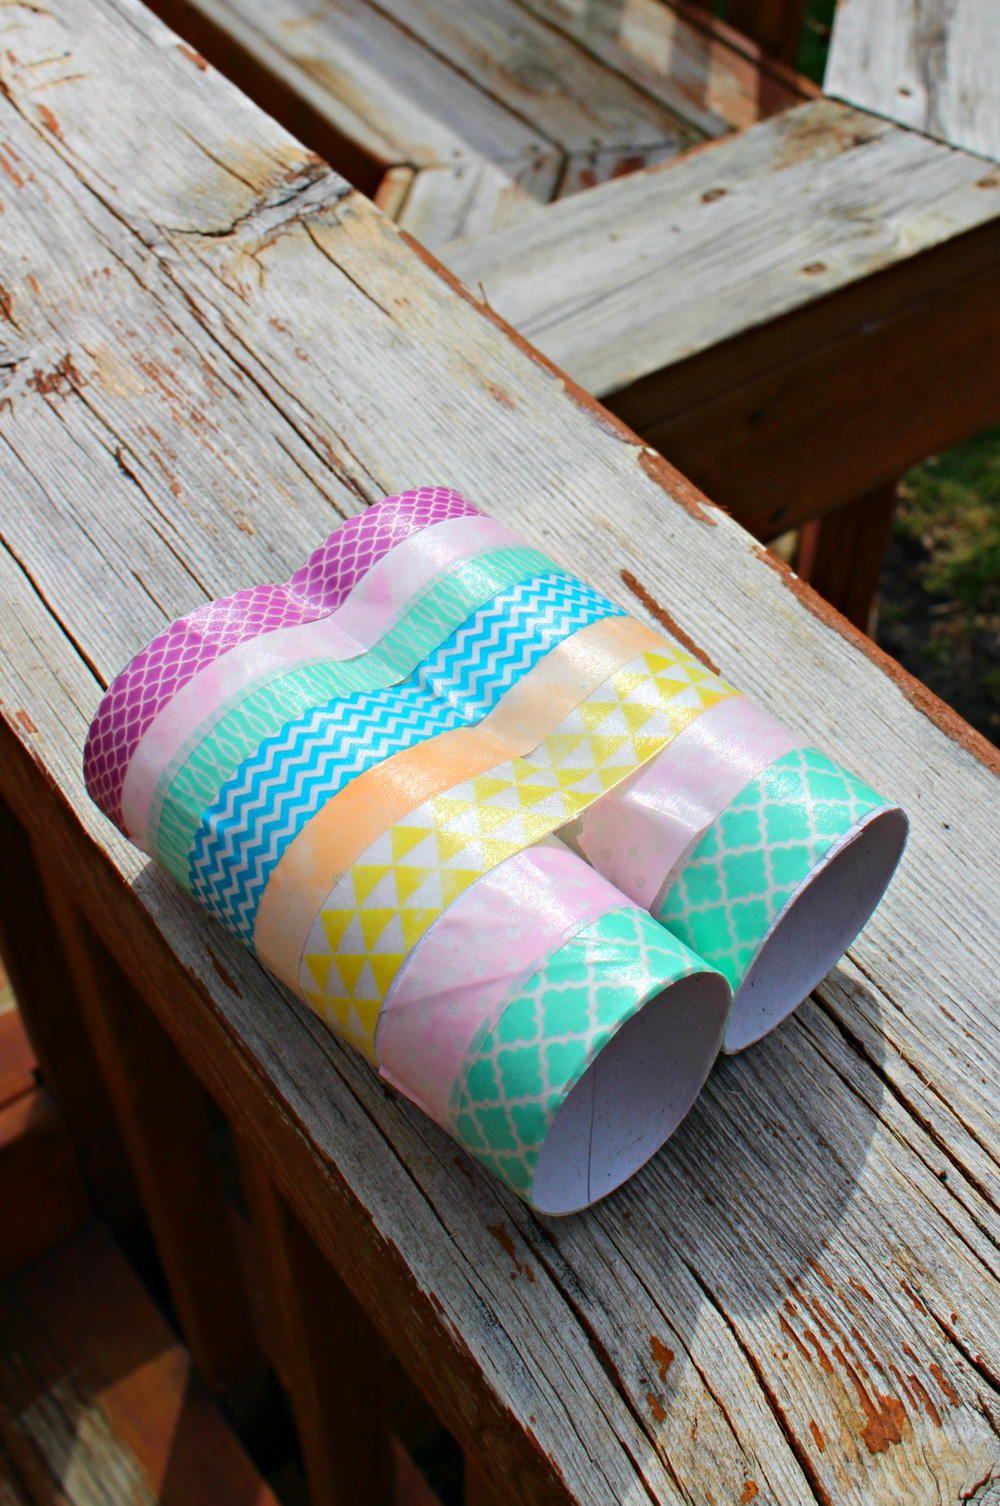 Binocular Craft For Kids Binocular Craft Crafts For Kids